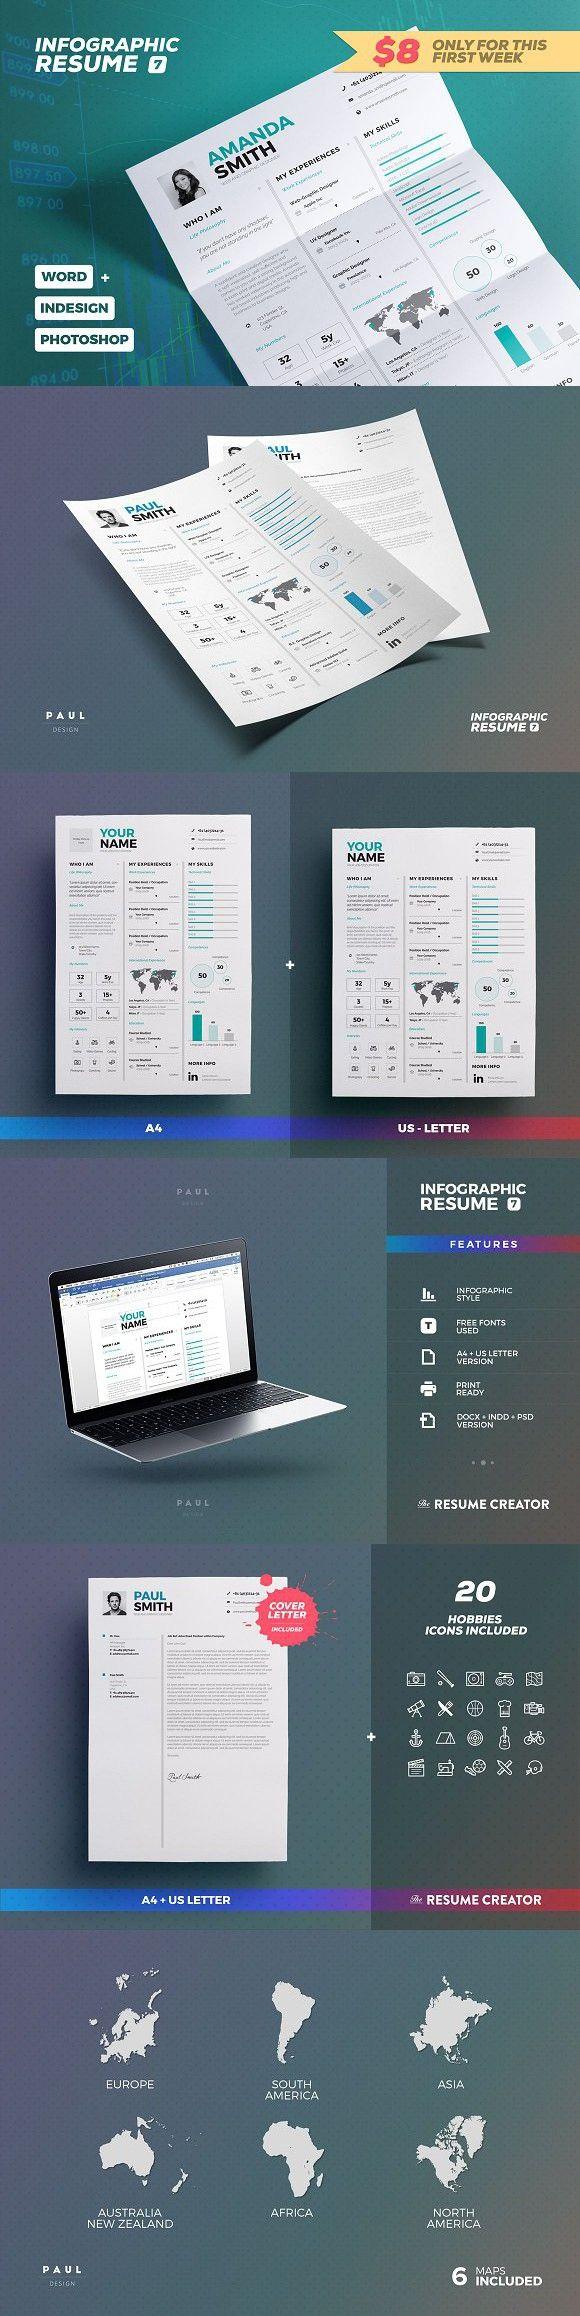 Infographic Resume/Cv Volume 7. Infographic Templates. $8.00  Infographic Resume Creator